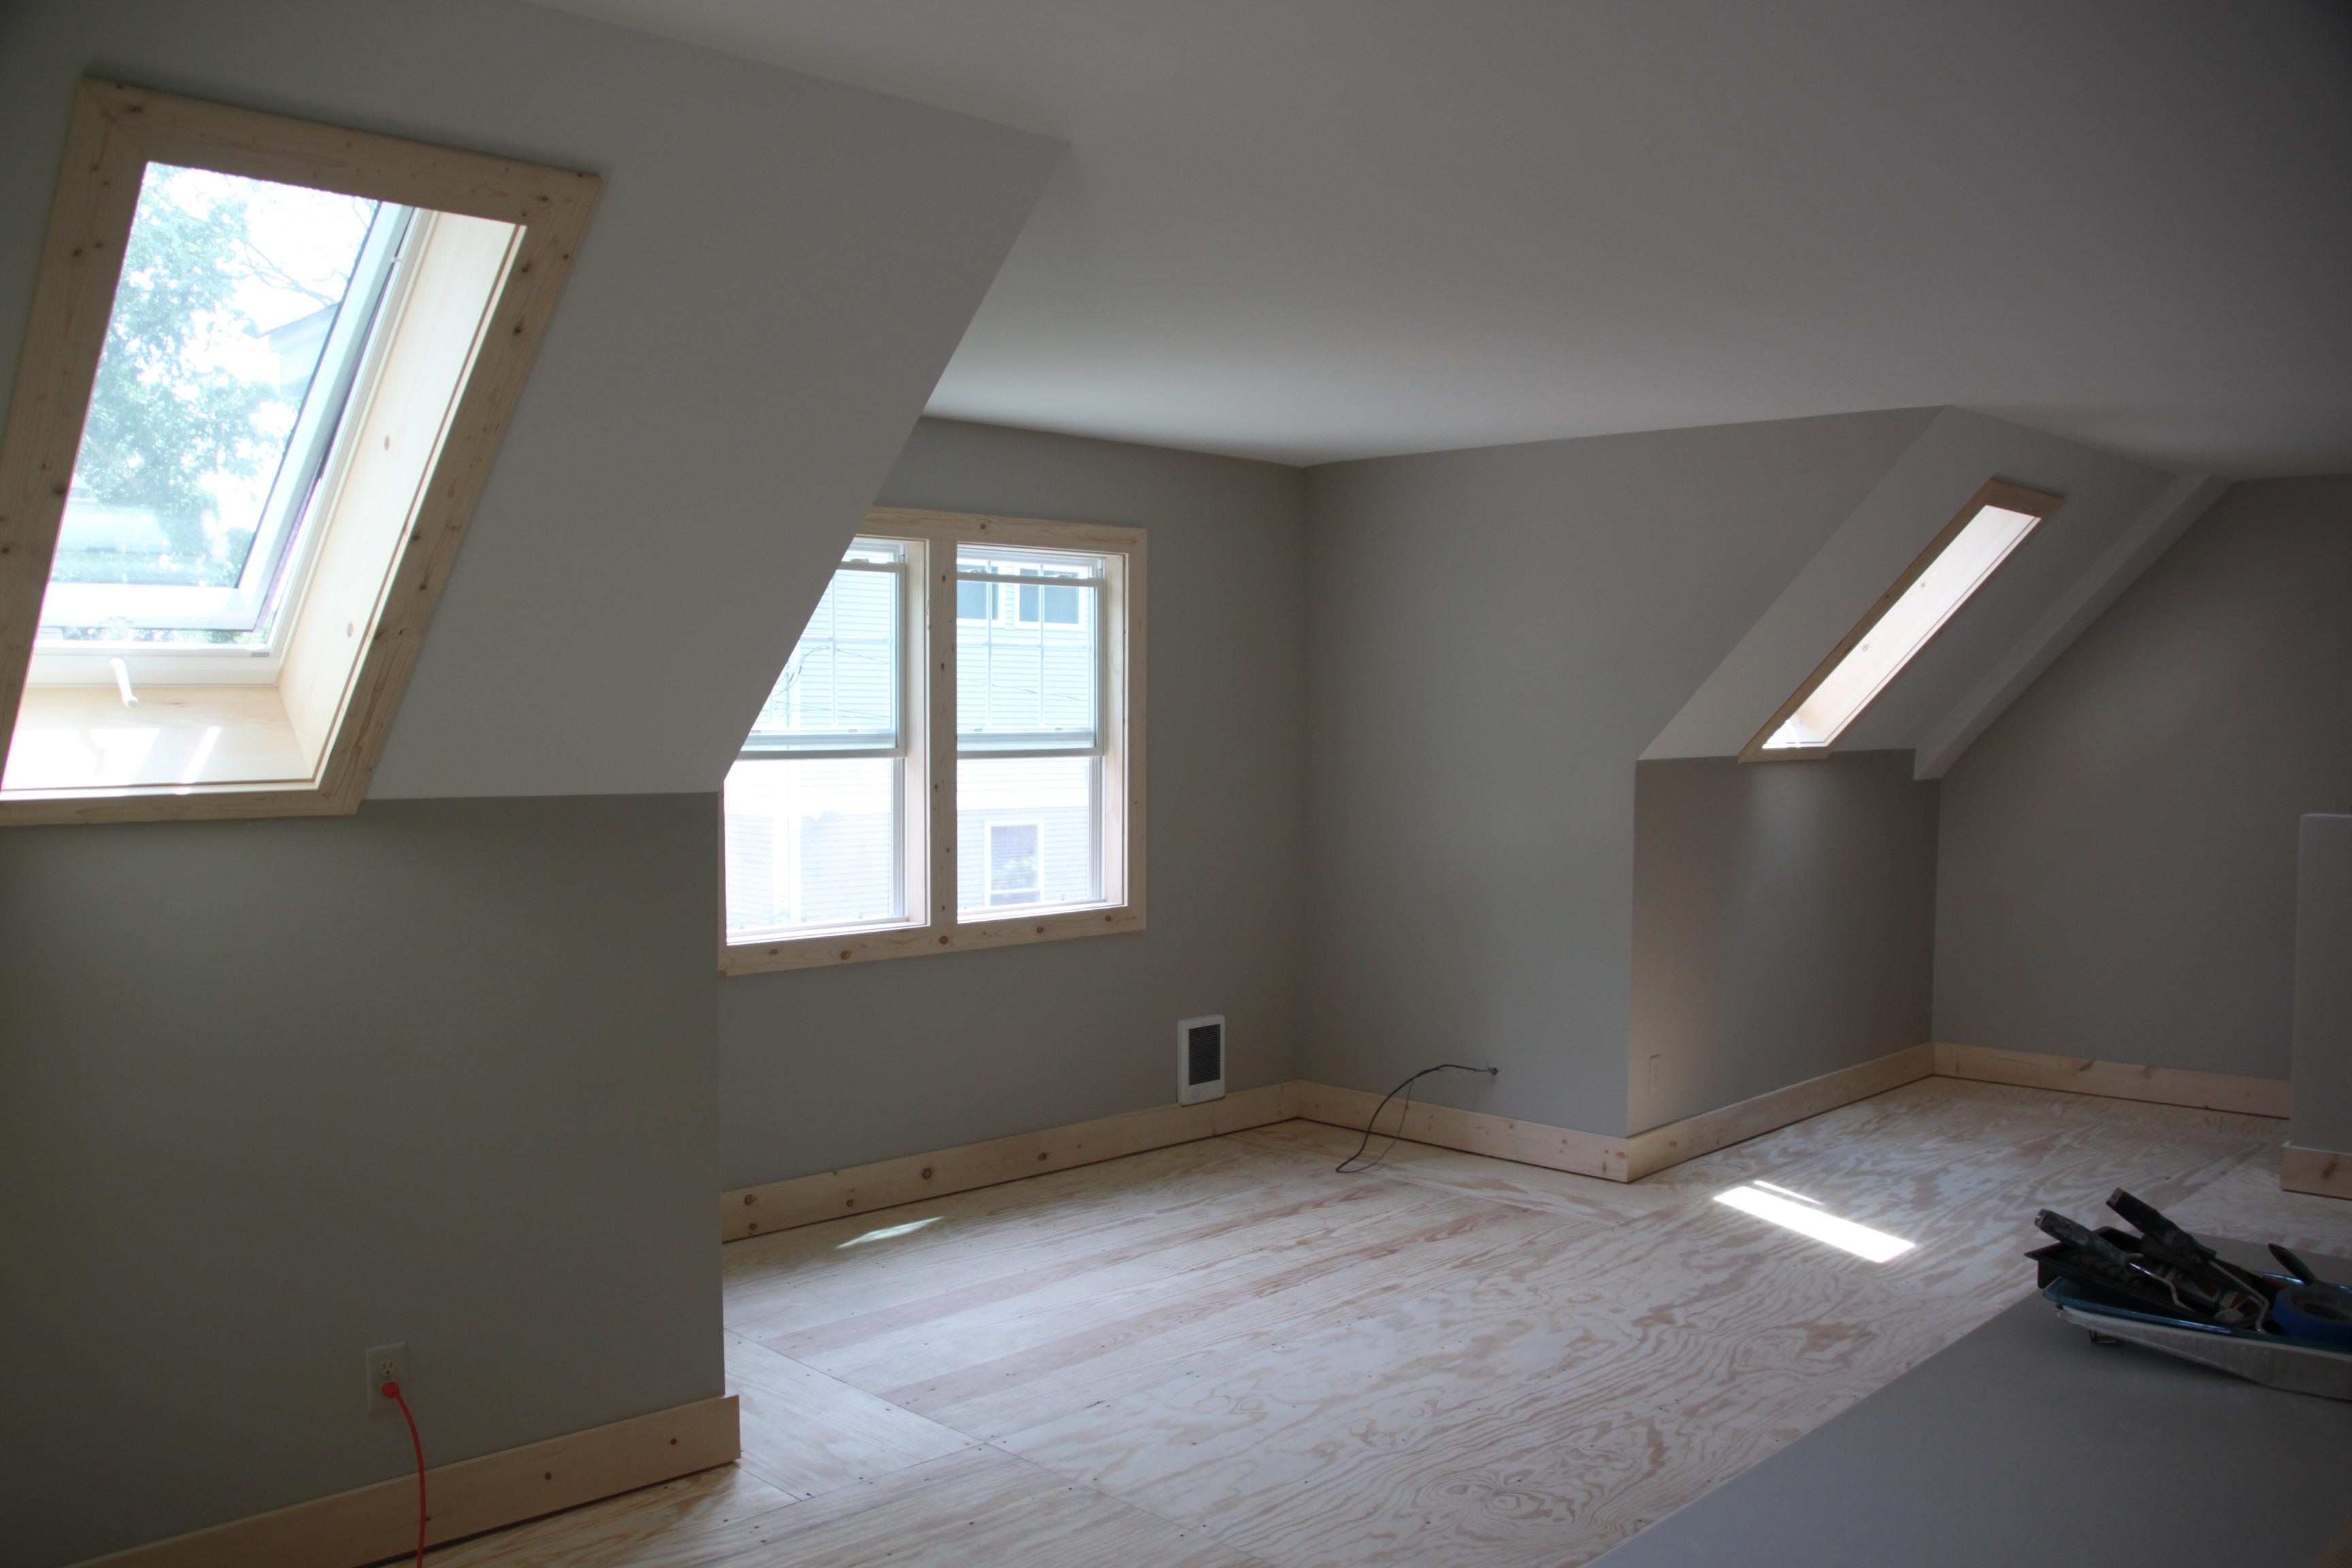 Dormer Room 2 car 2 story garage using attic trusses and dormer